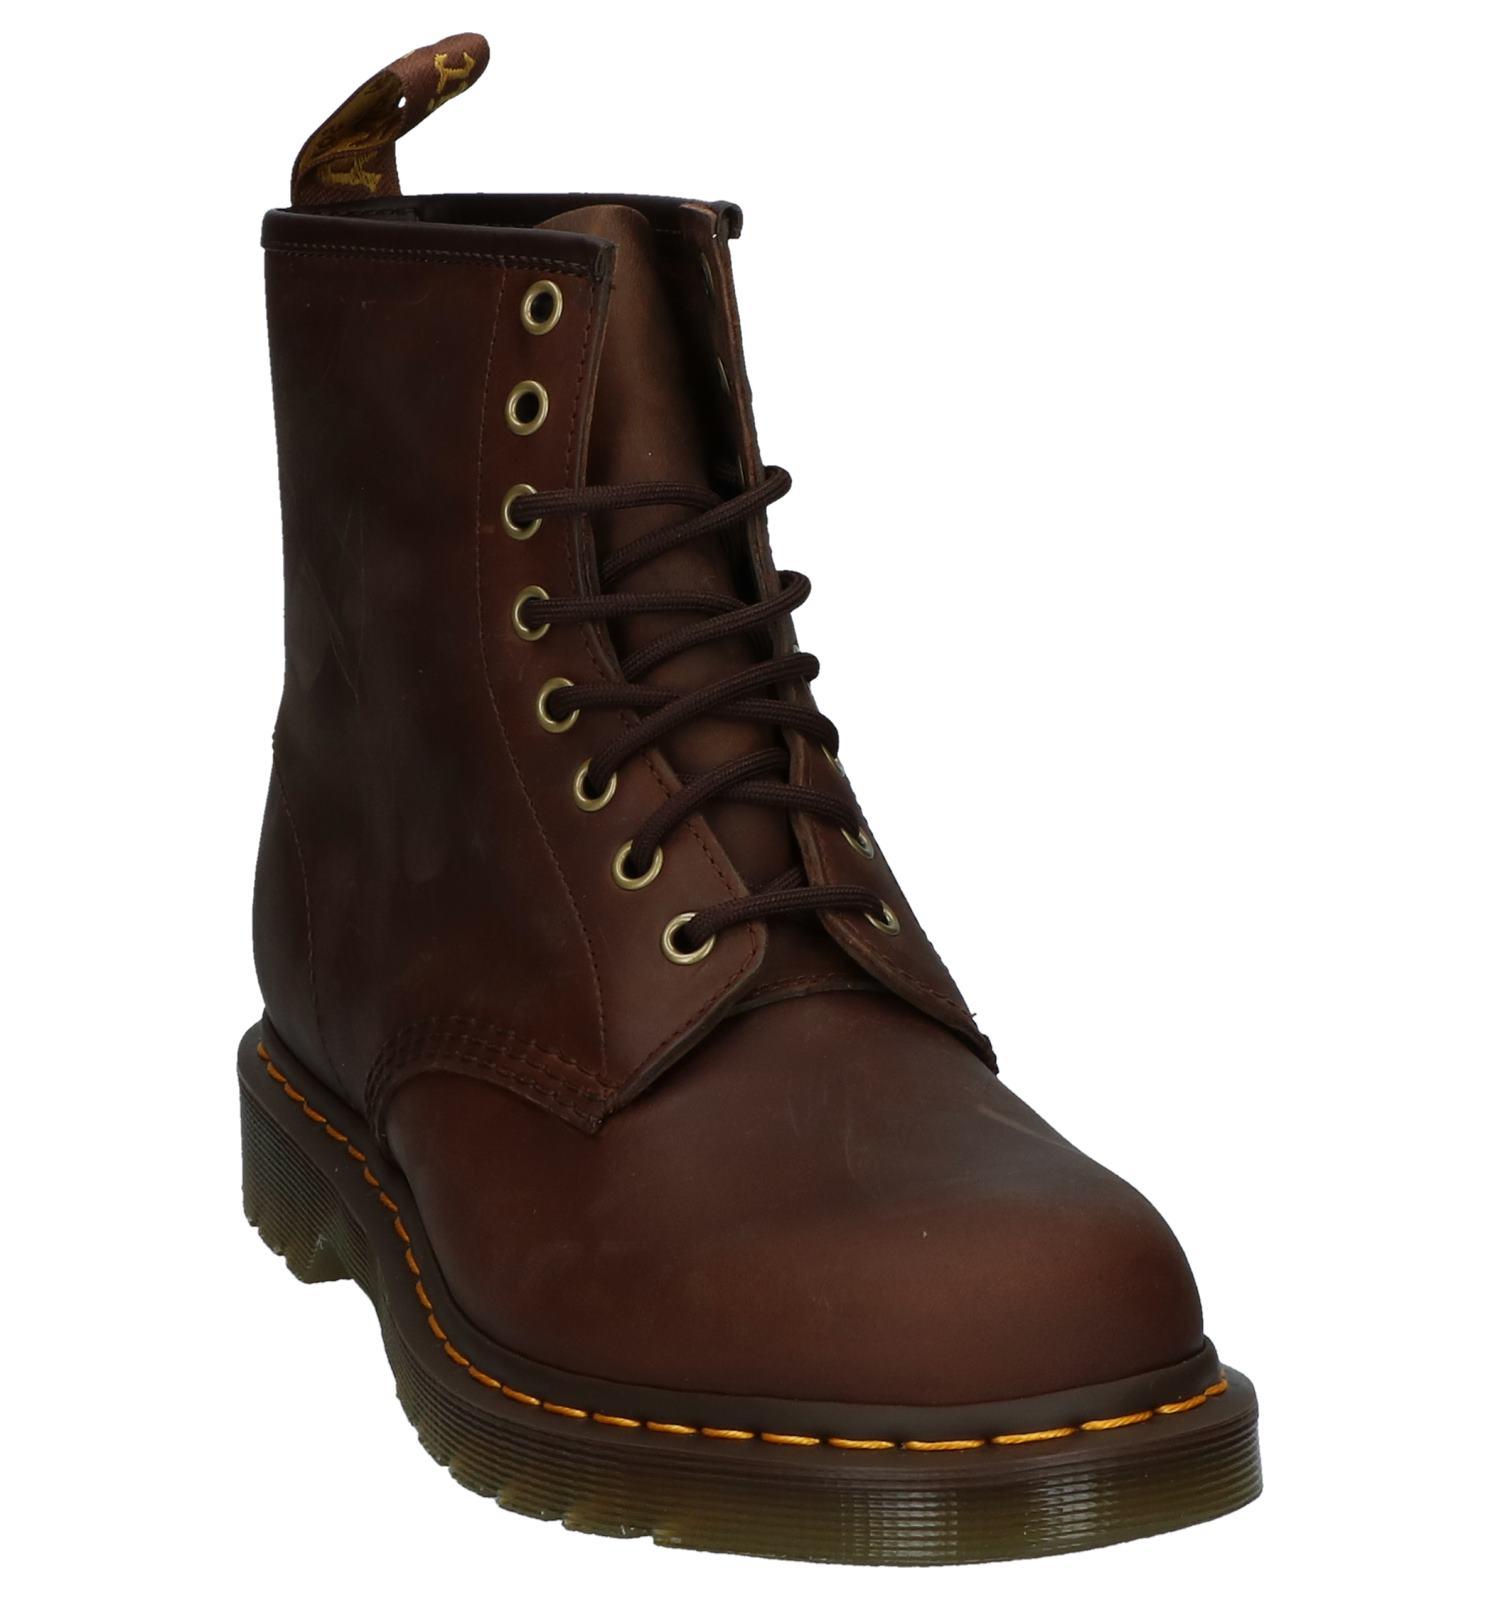 Stoere Boots Bruin Donker DrMartens Eye Boot I7gbfY6yvm